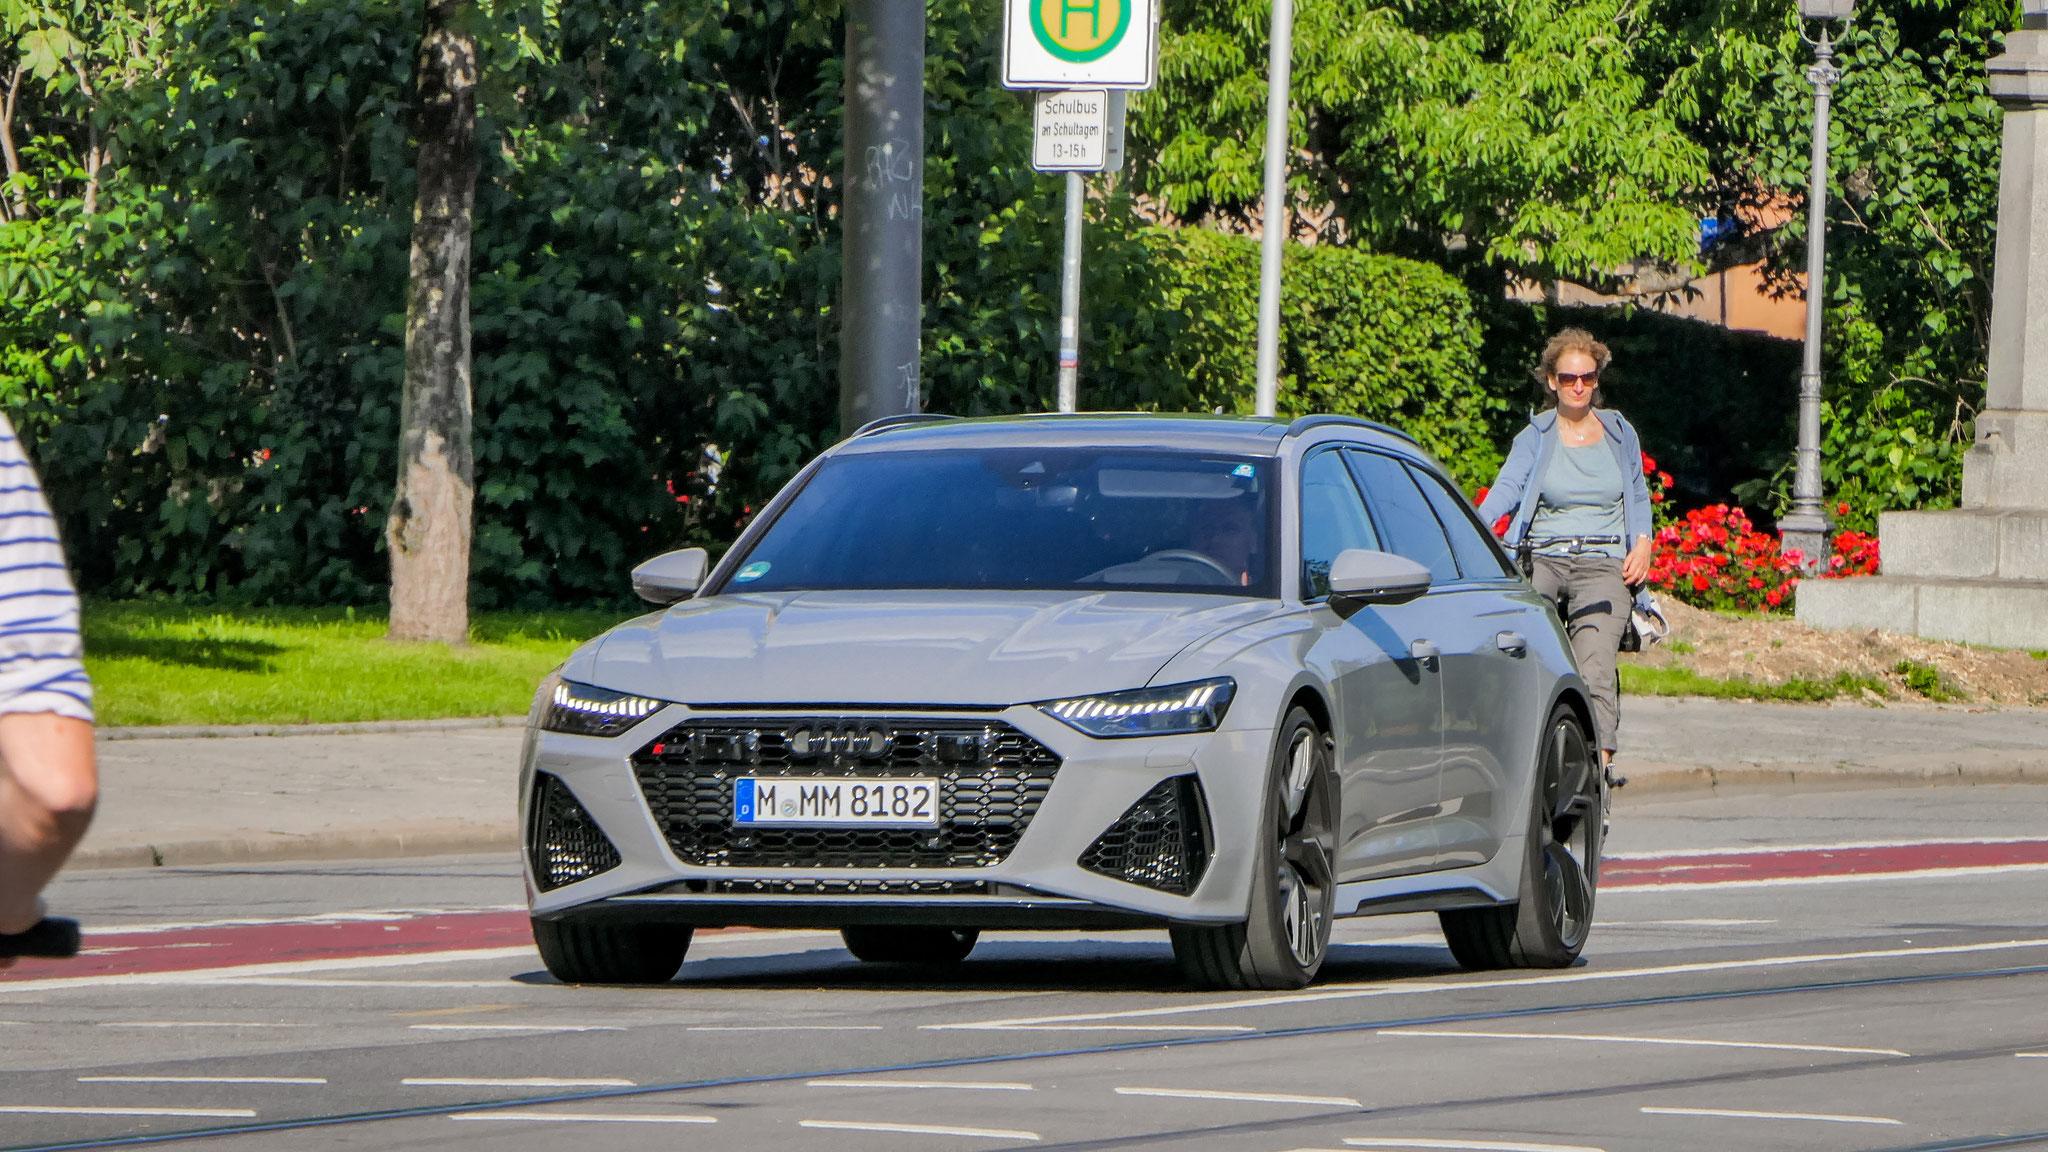 Audi RS6 - M-MM-8182